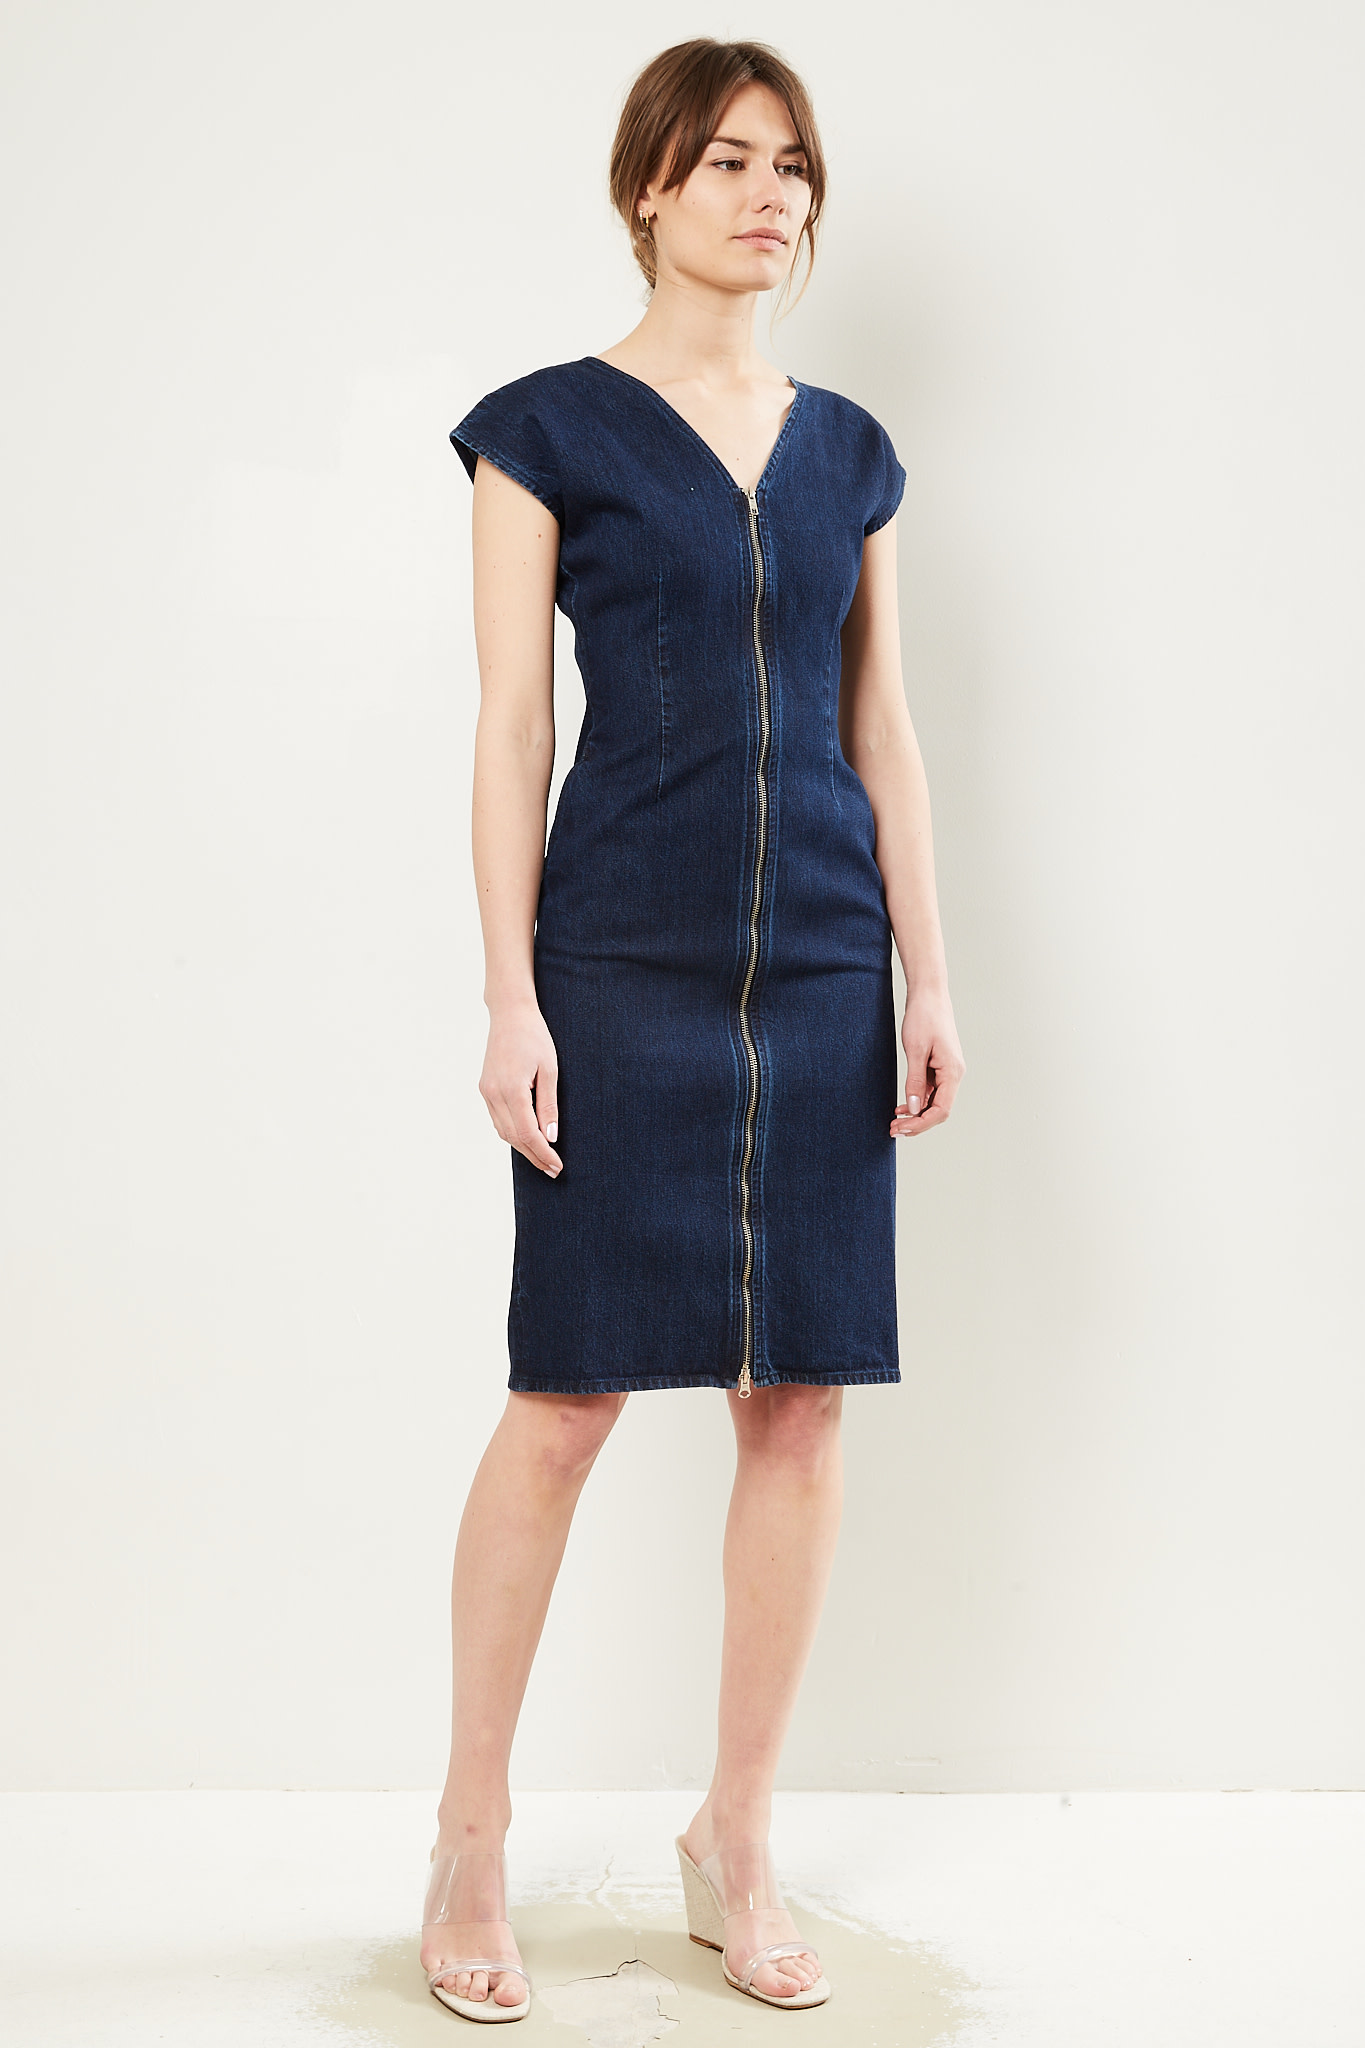 Facon Jacmīn - Ruby zip dress